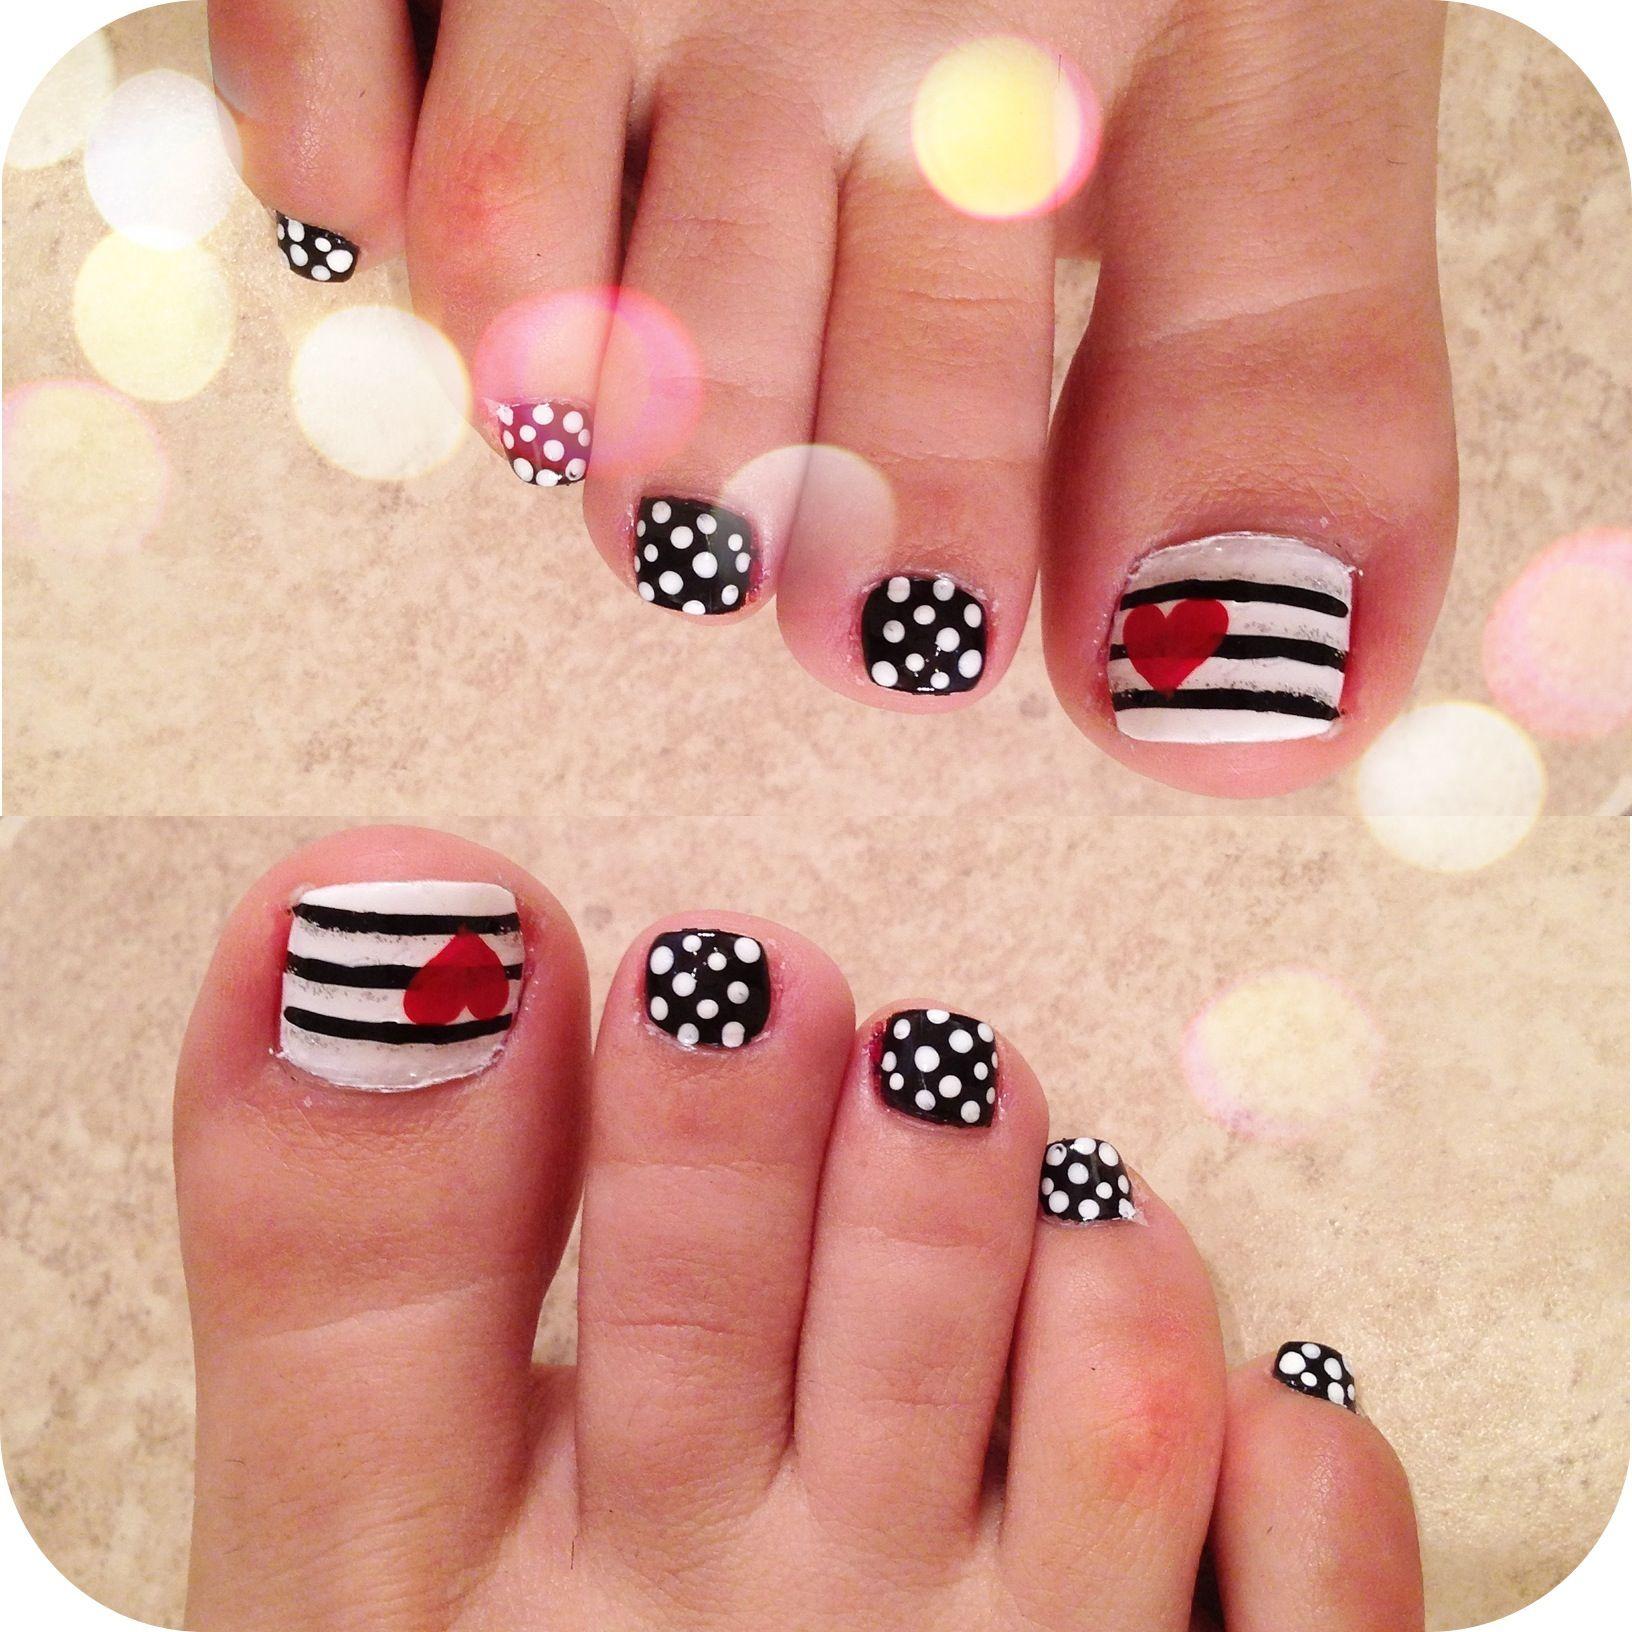 Love My Pedicure Nail Design Stripes Polka Dots Hearts Black